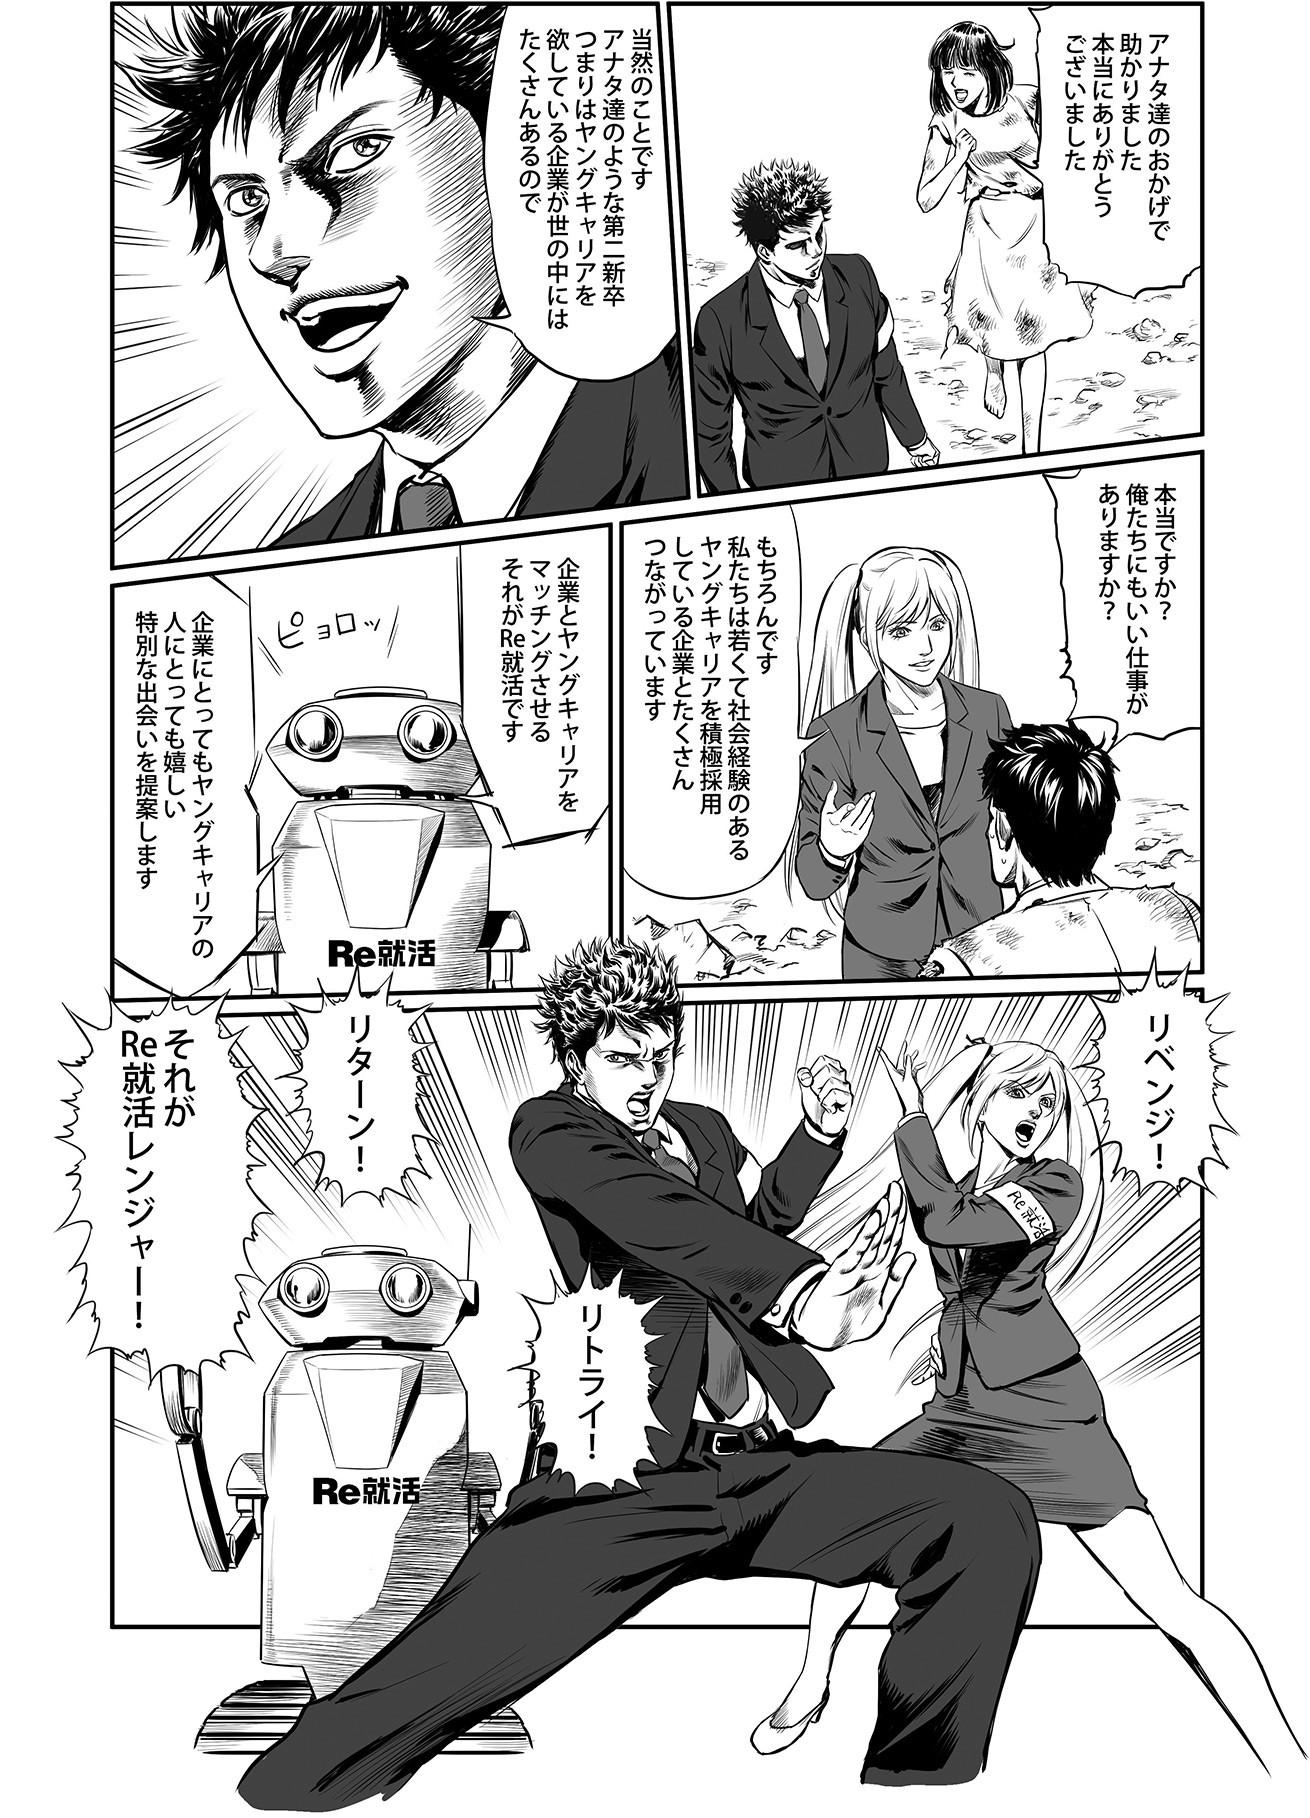 gakujo11_1310